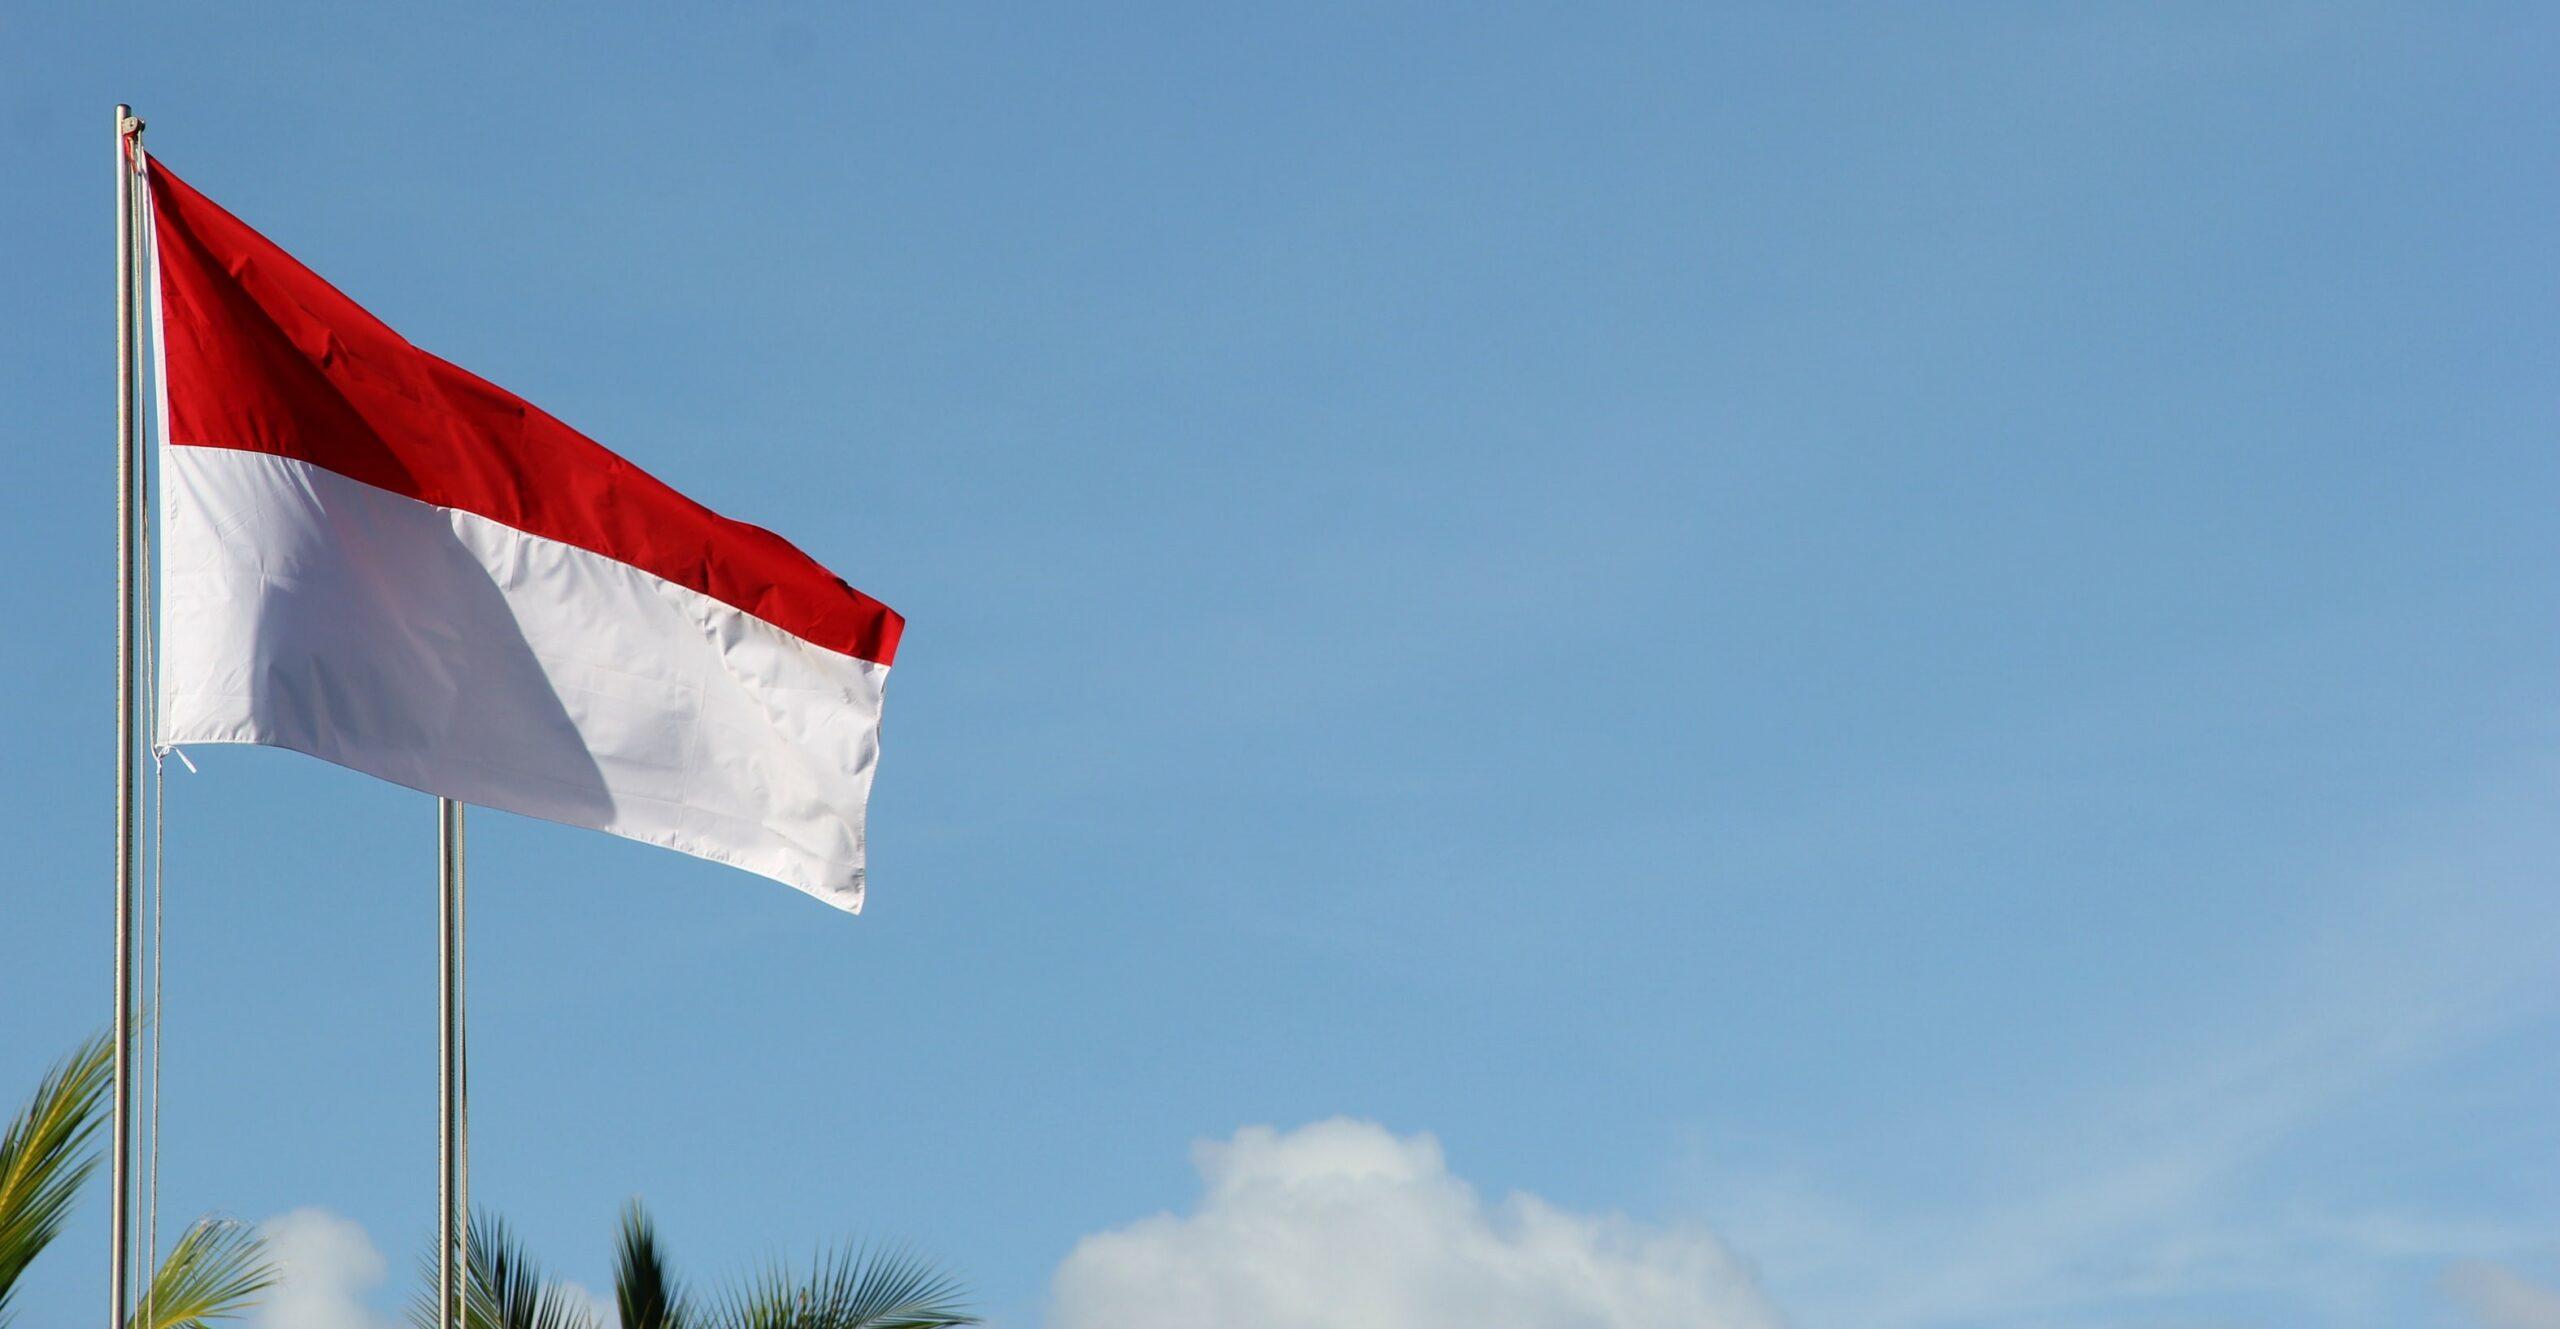 Indonesia: The killing of Gusti Nugraha